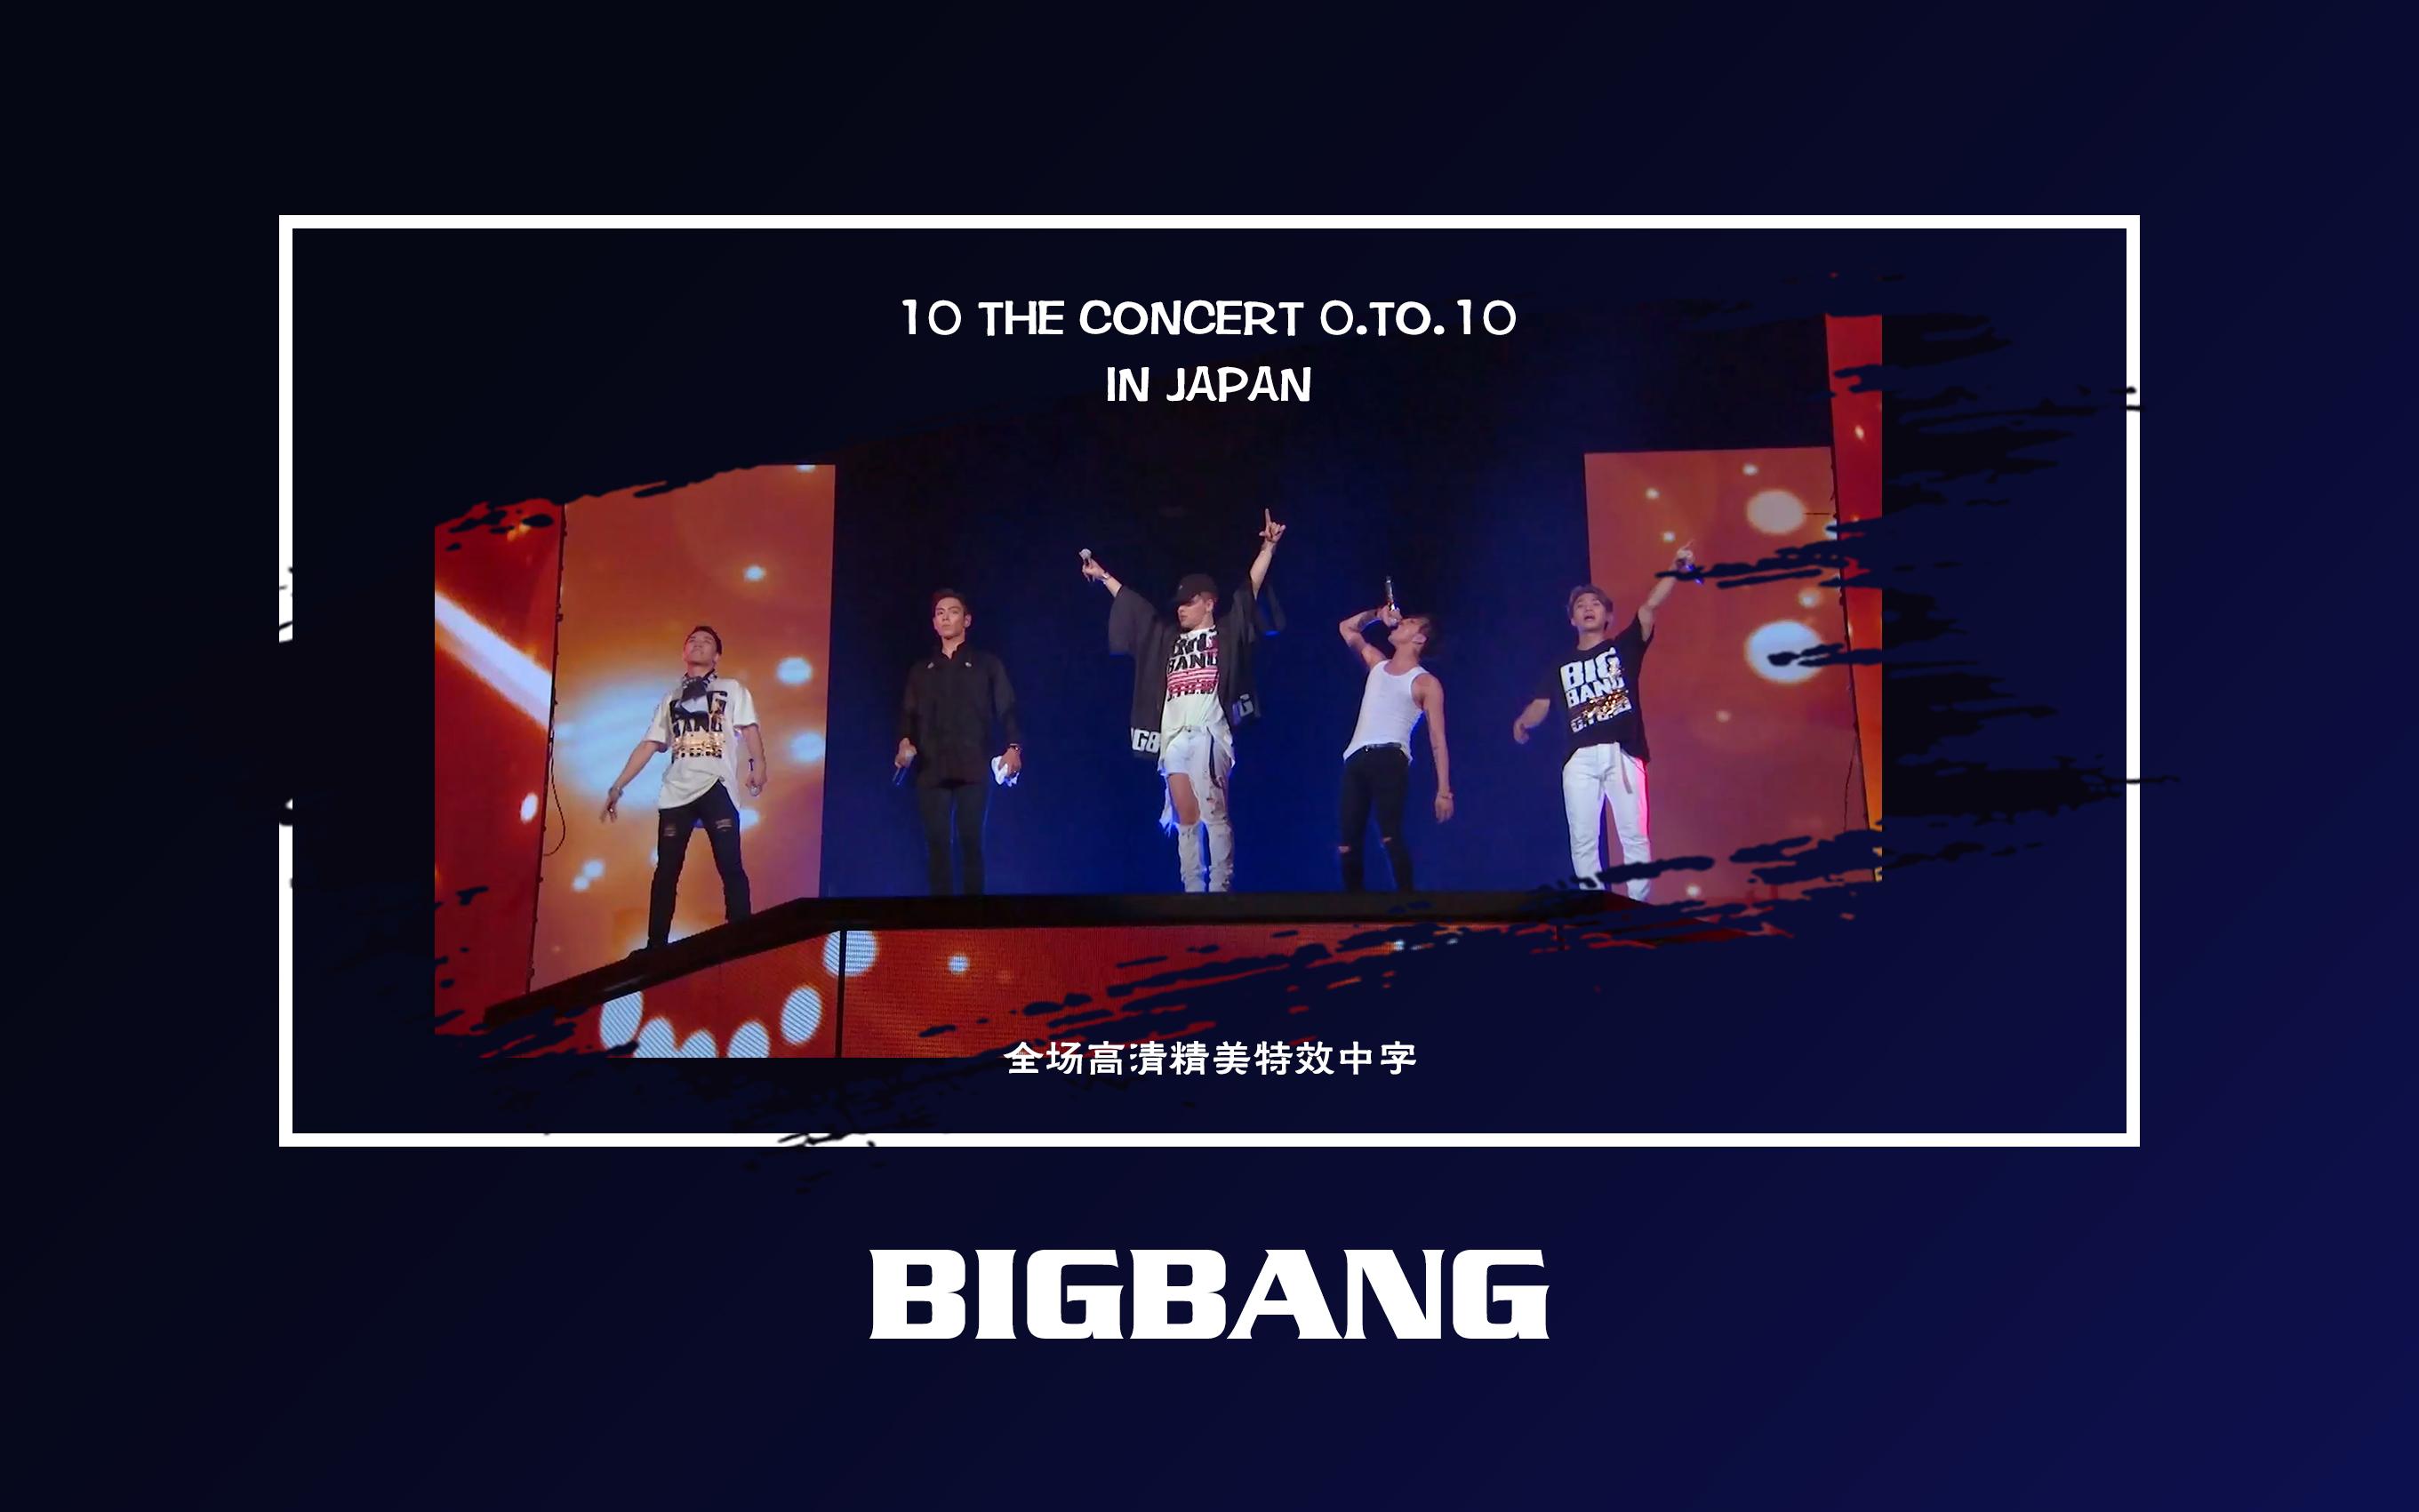 【BIGBANG】2016 BIGBANG 10 THE CONCERT 0.TO.10 IN JAPAN 全场高清中字 Part2